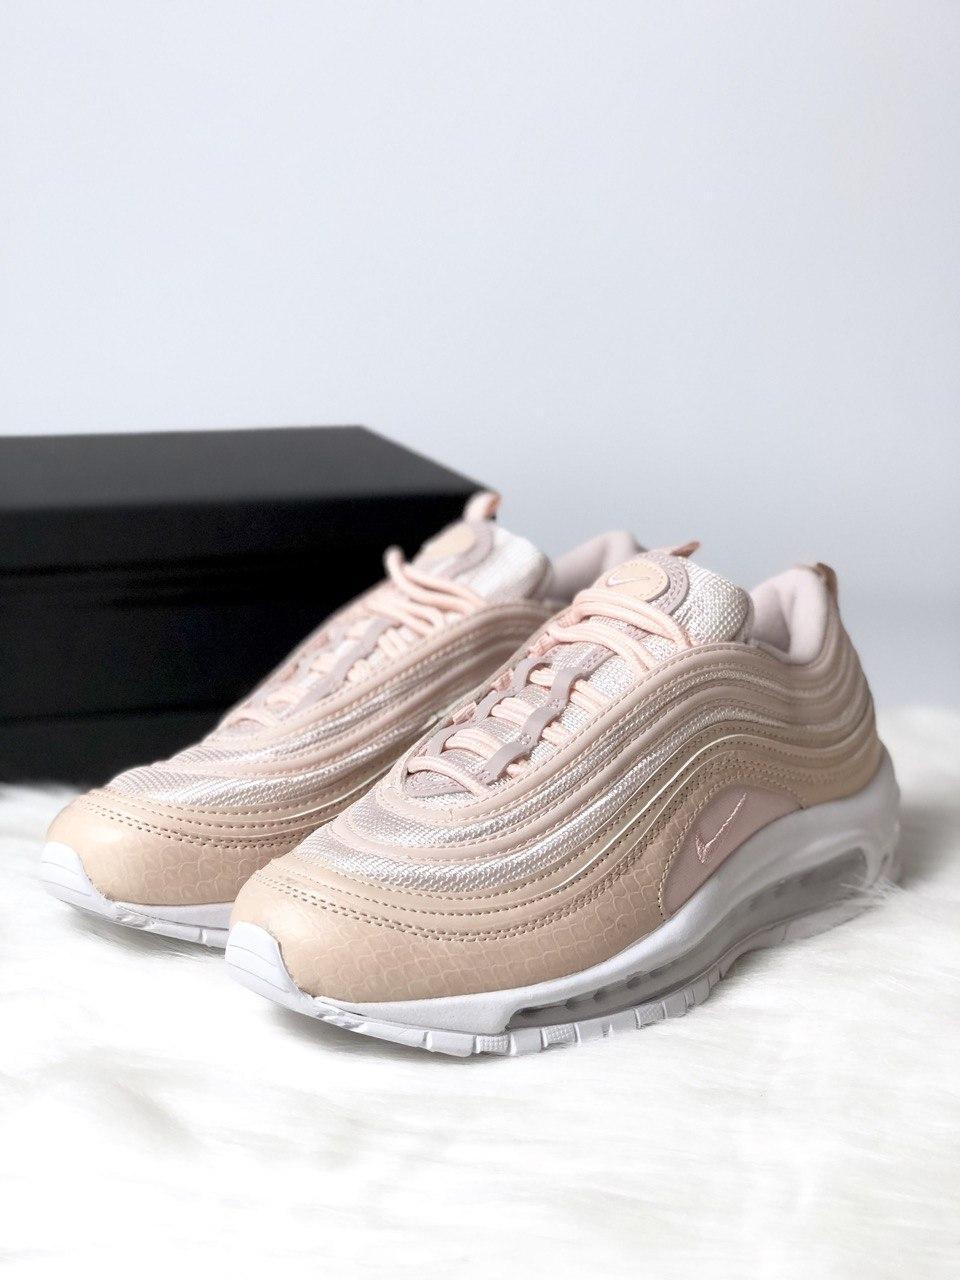 Женские кроссовки Nike Air Max PA65 светло-розовые